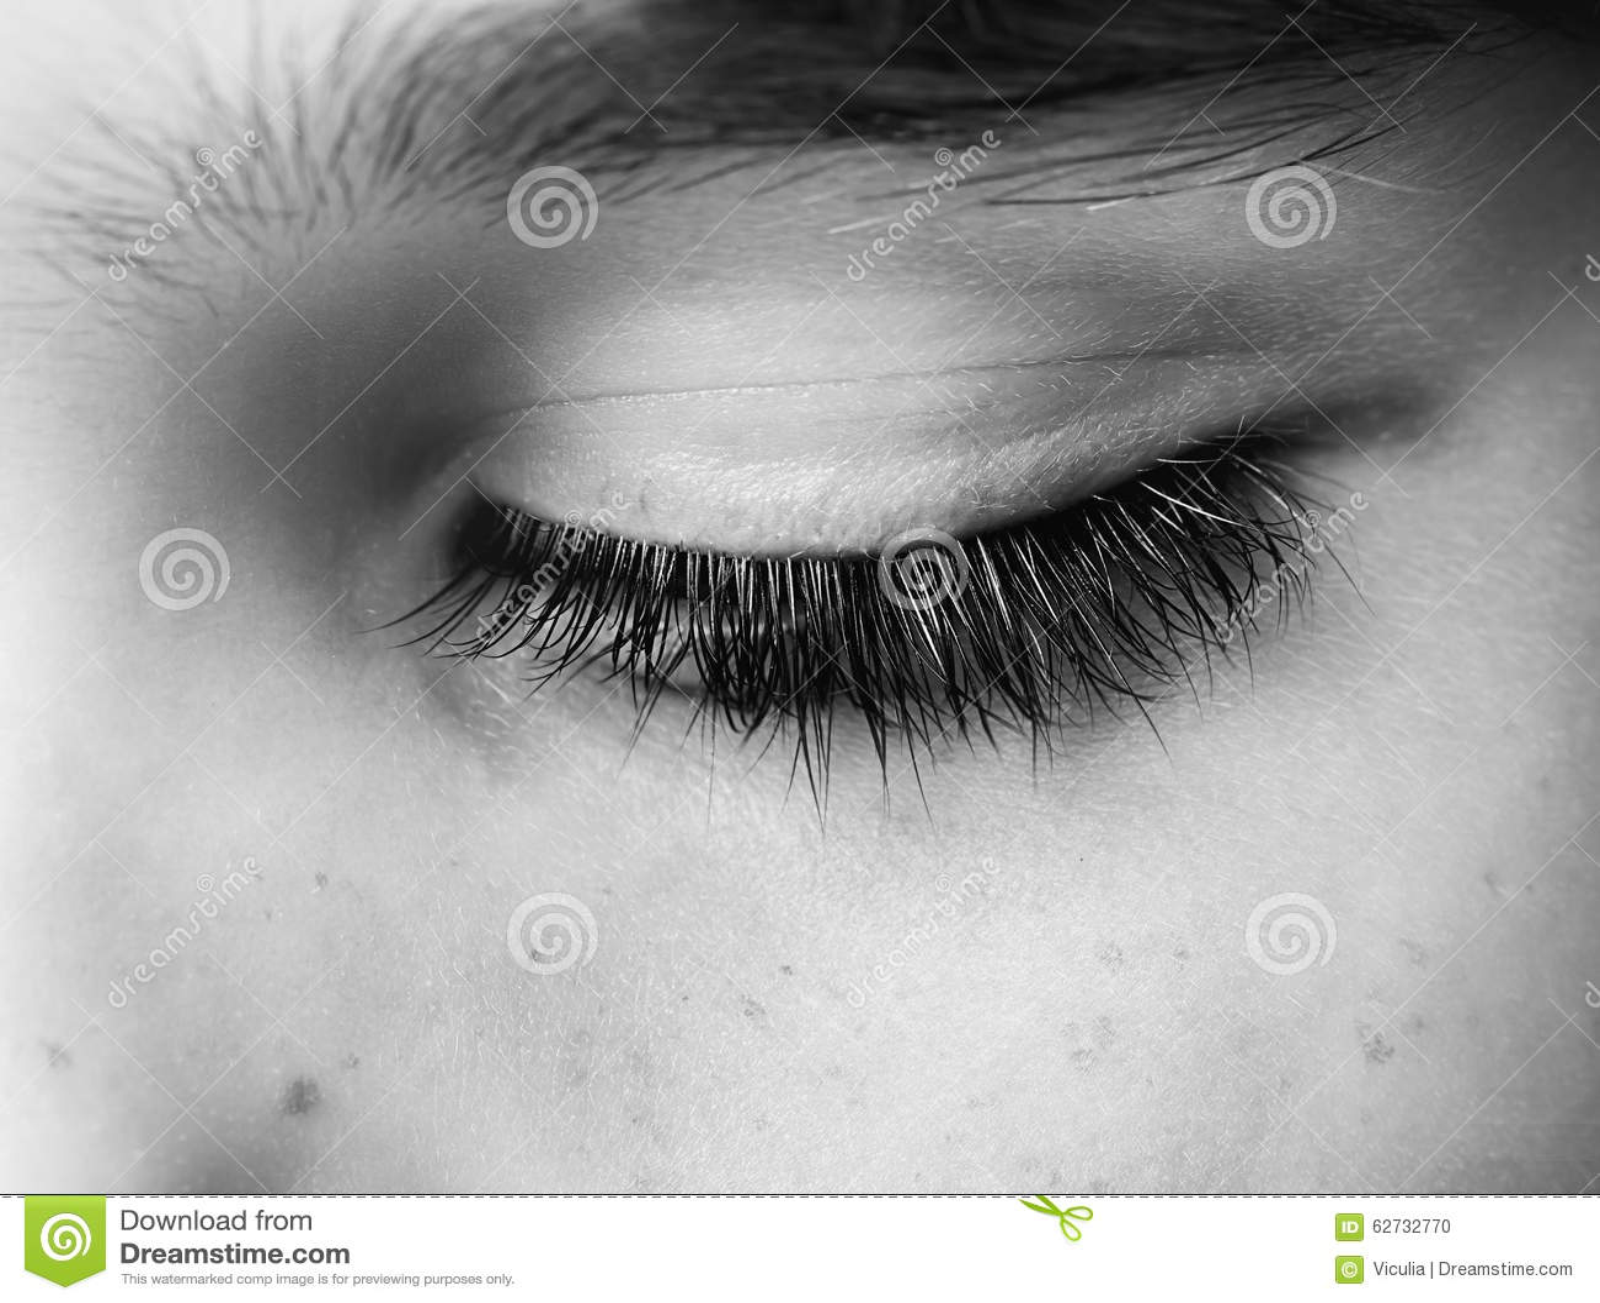 Closed human eye close up studio shot.